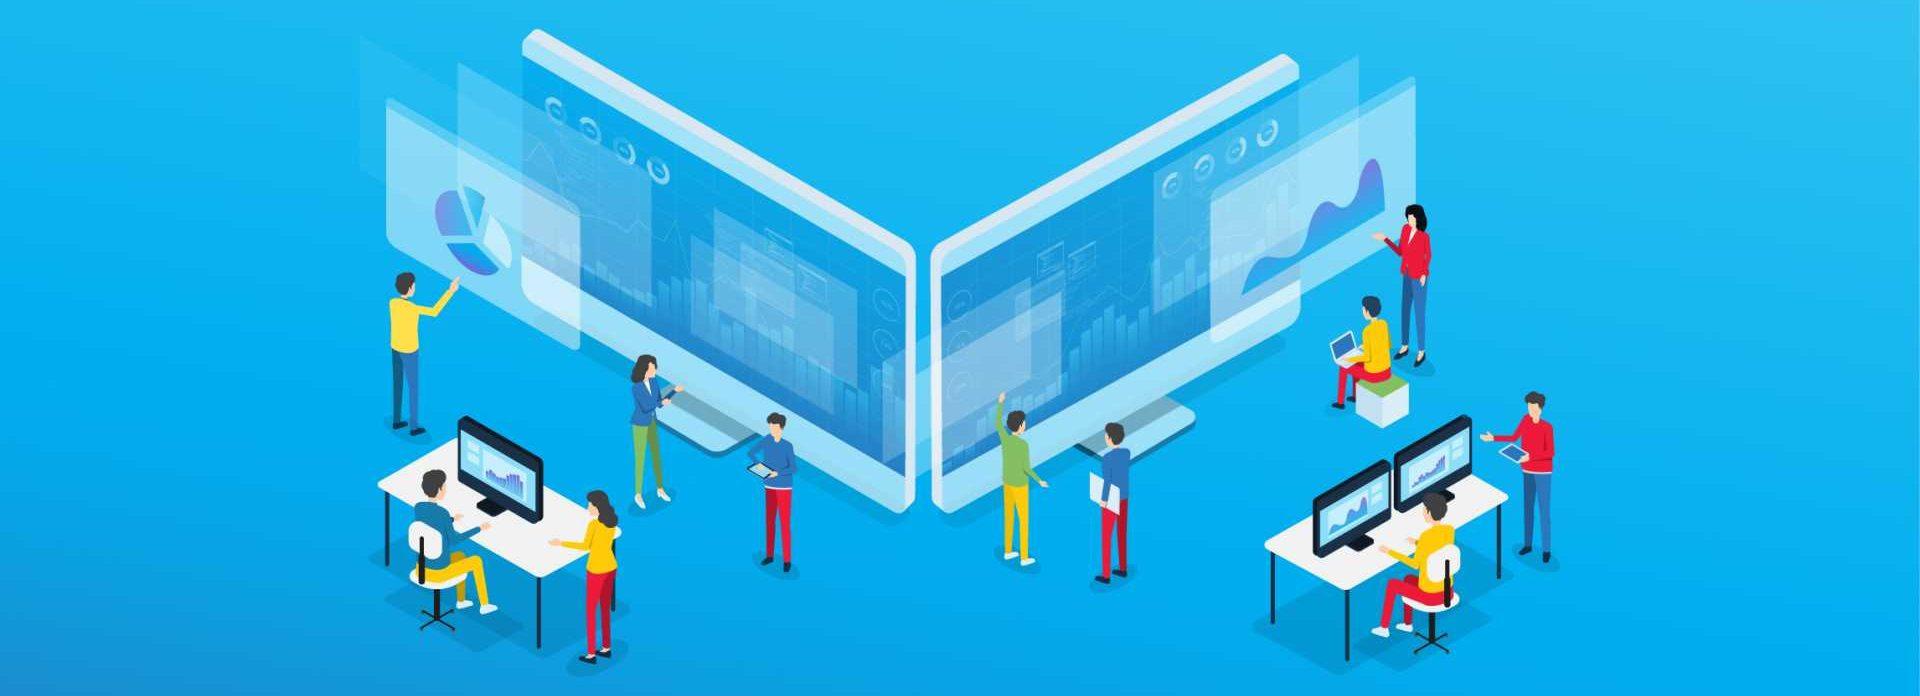 CROP - Digital roadmap Digital Strategy Digital Transformation Made Smarter - Stock image